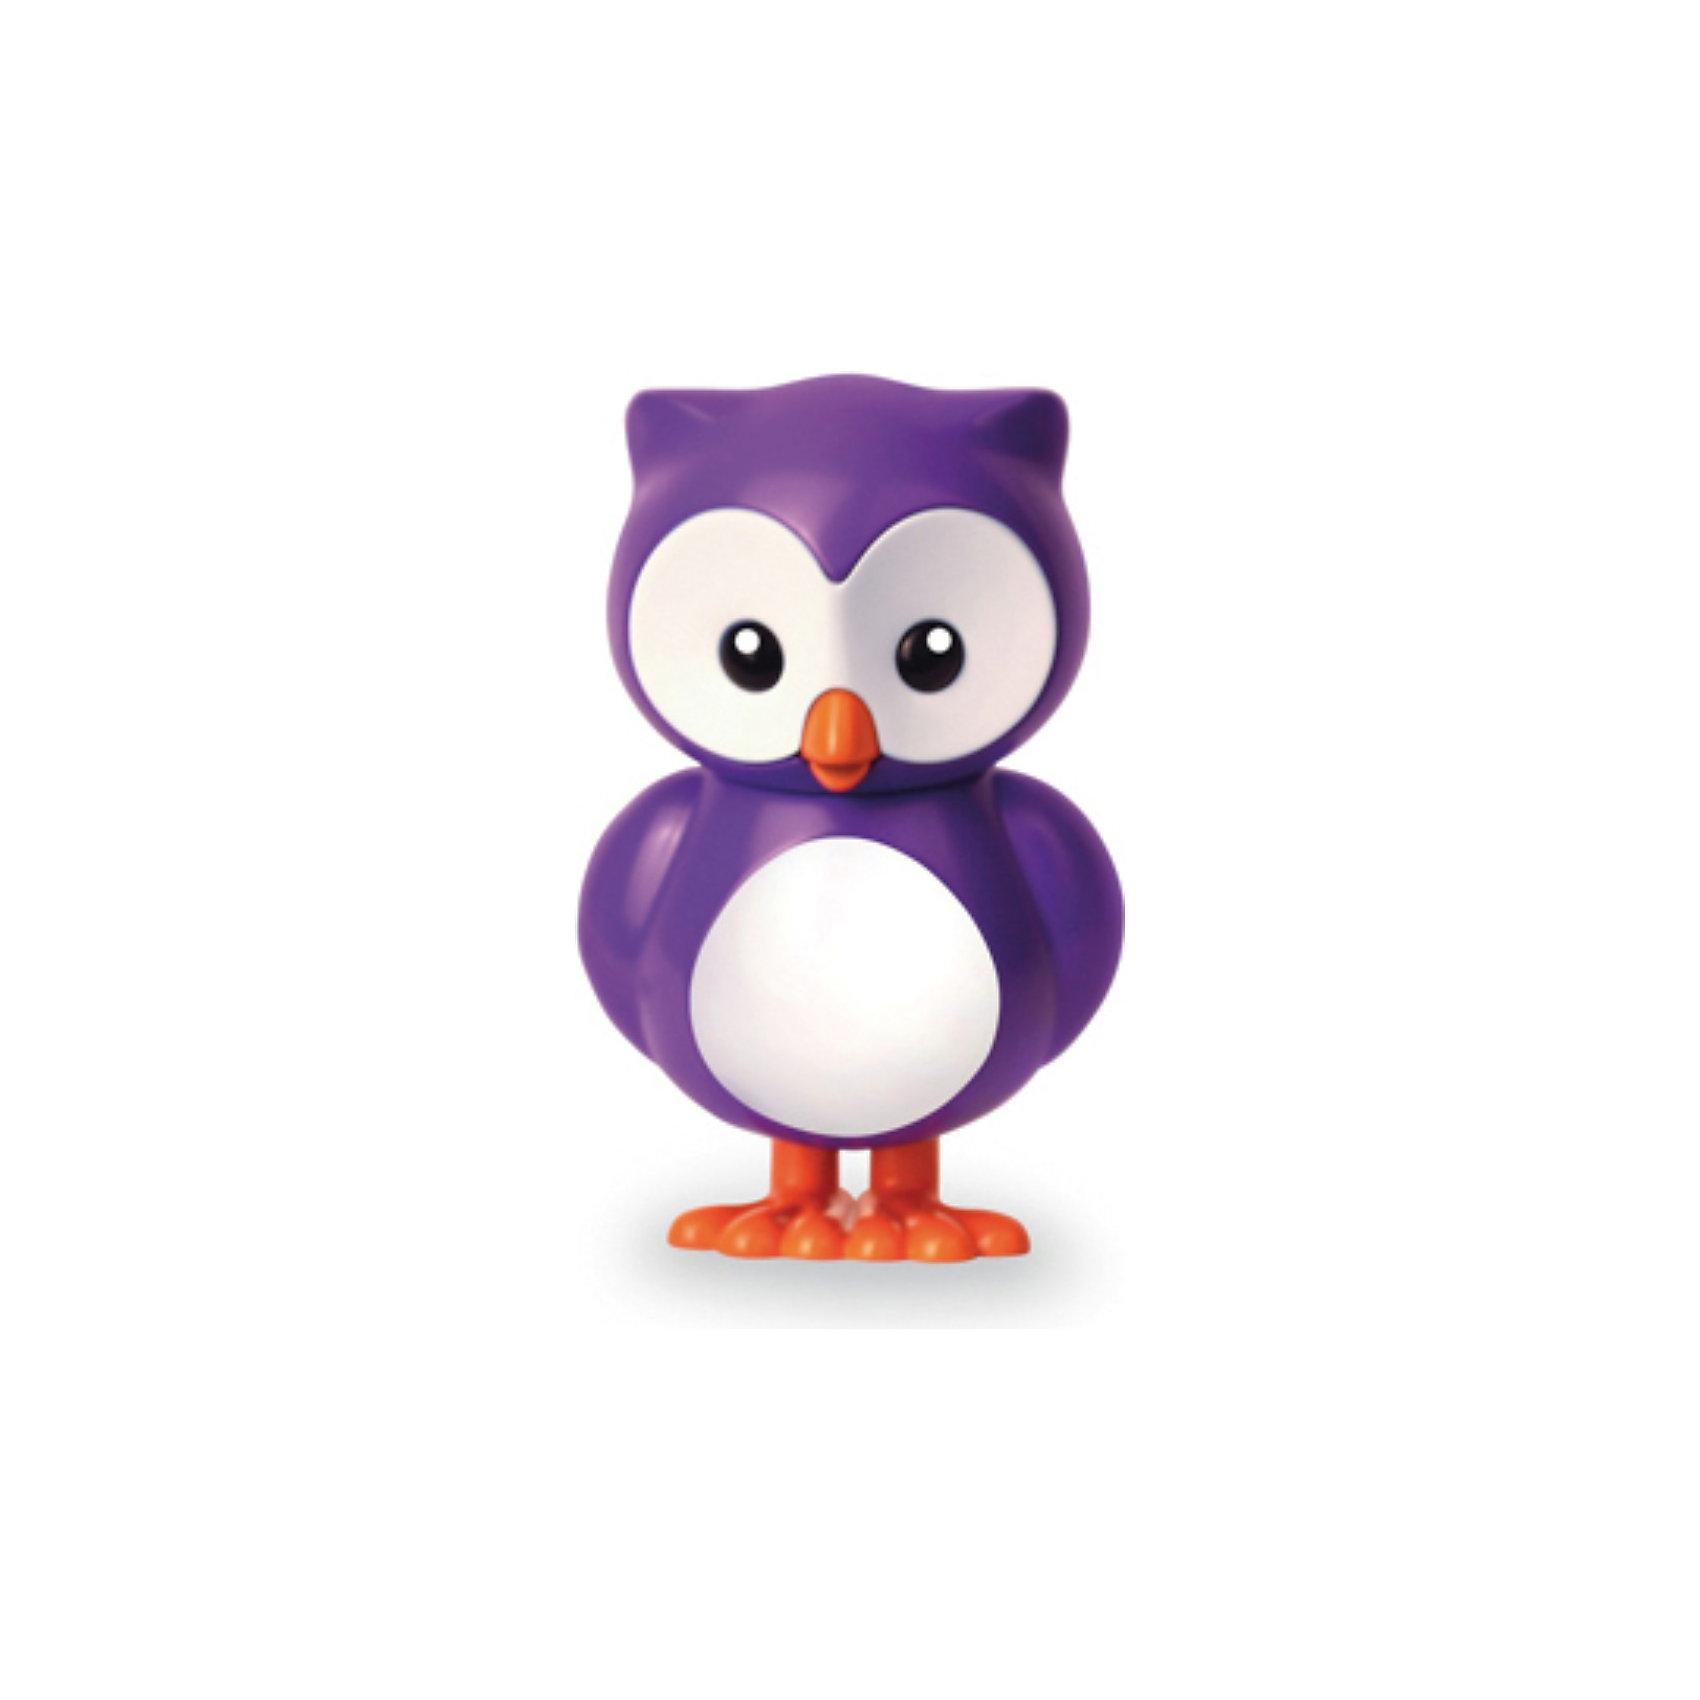 TOLO Фигурка Сова, Первые друзья, TOLO развивающие игрушки tolo toys тюлень